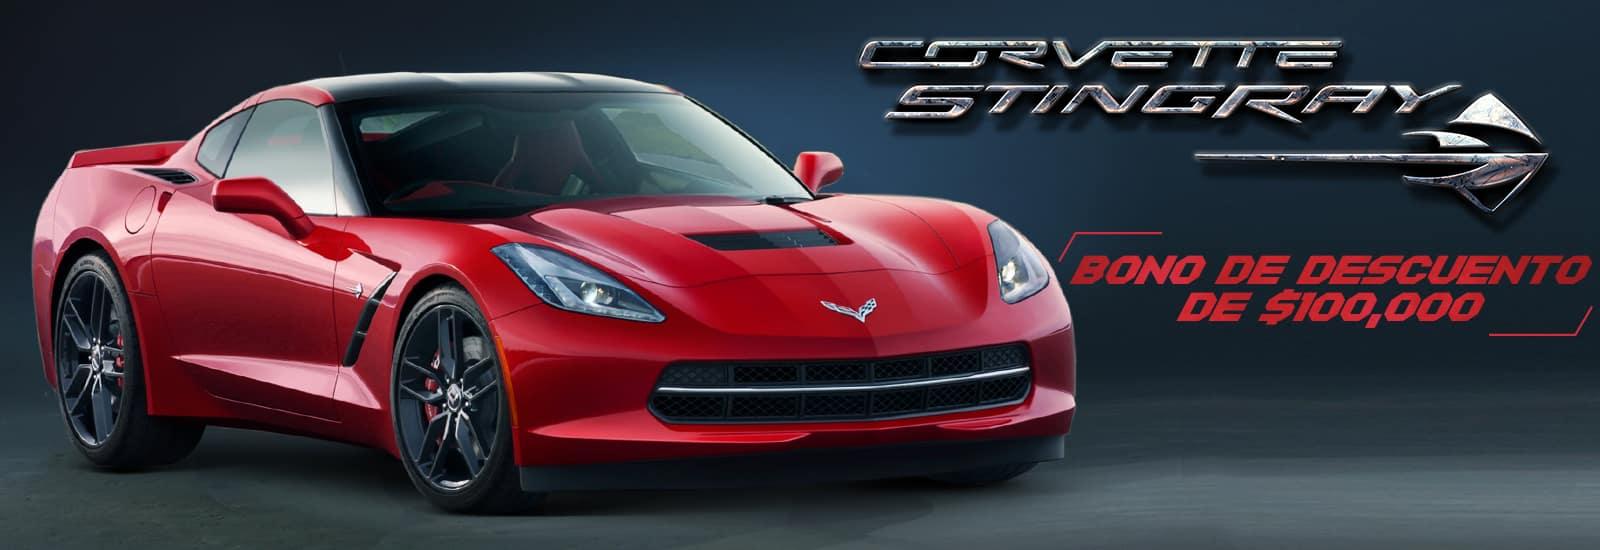 corvette stingray 2017 en monterrey